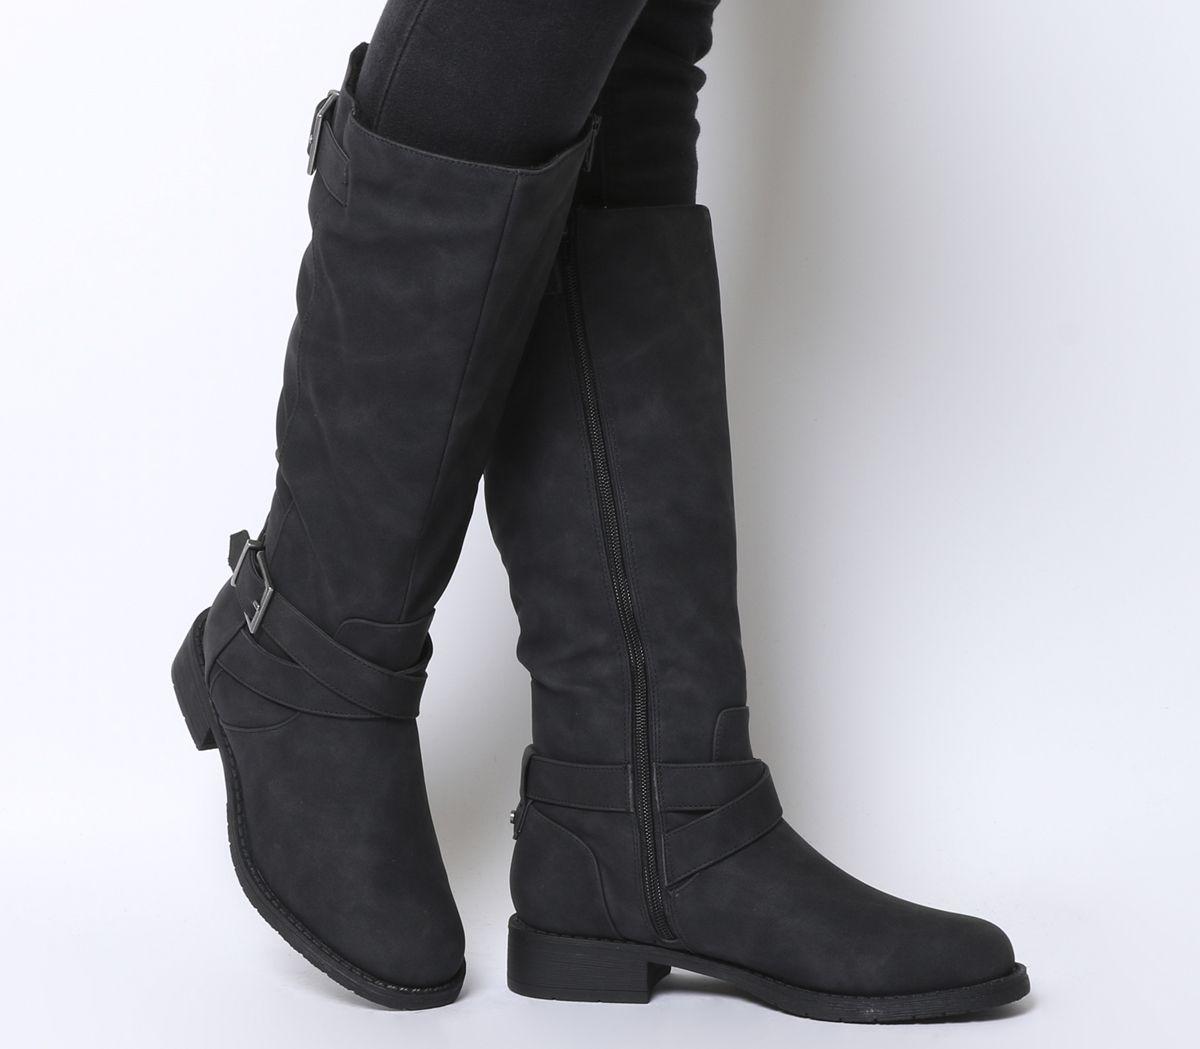 3868192954e Office Kamel Biker Knee Boots Black Fur Lined - Womens Boots